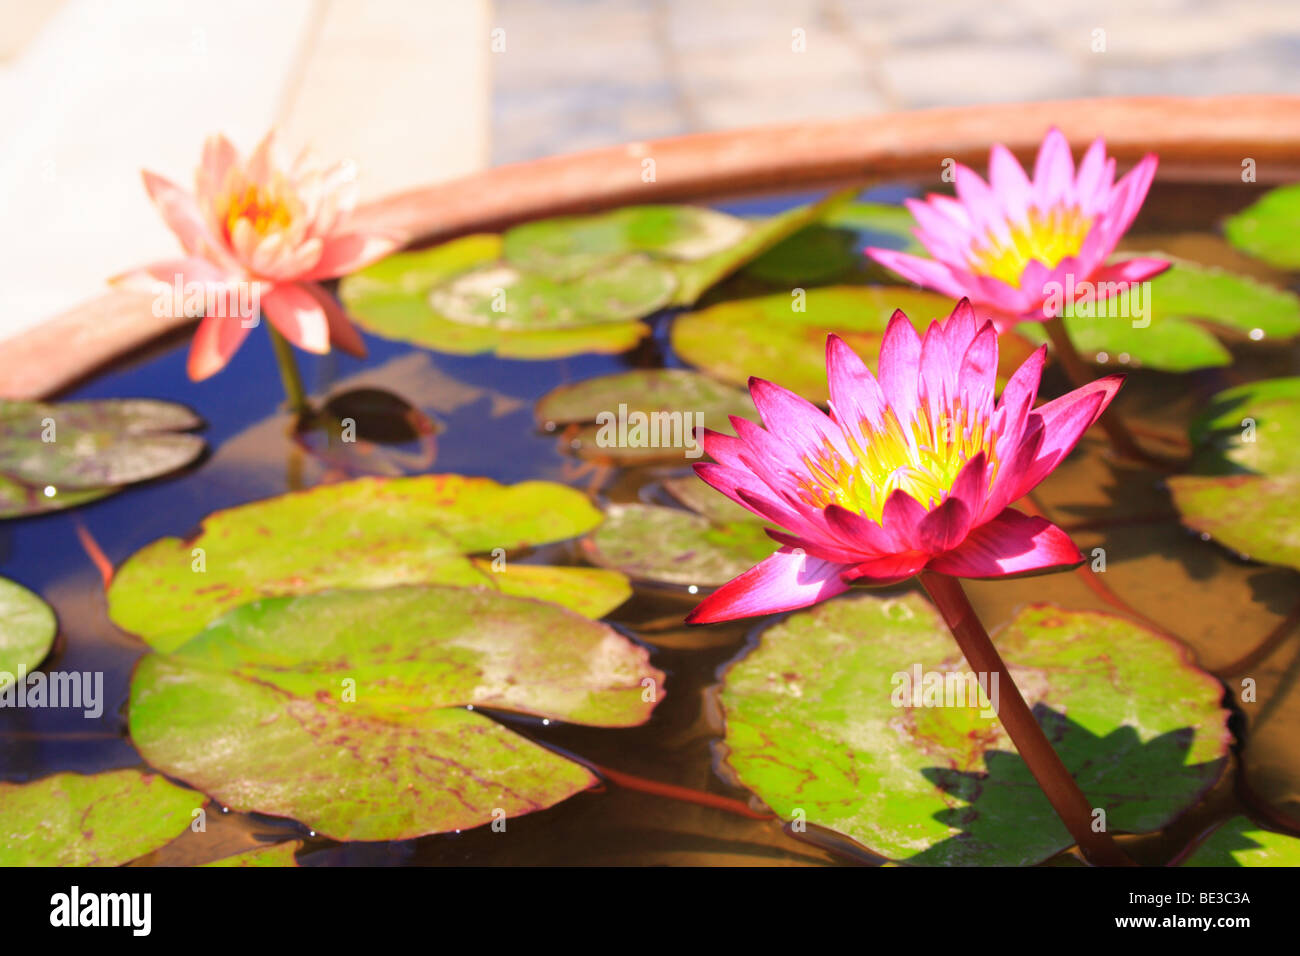 Lotus flowers, Bogyeongsa, Republic of Korea Stock Photo